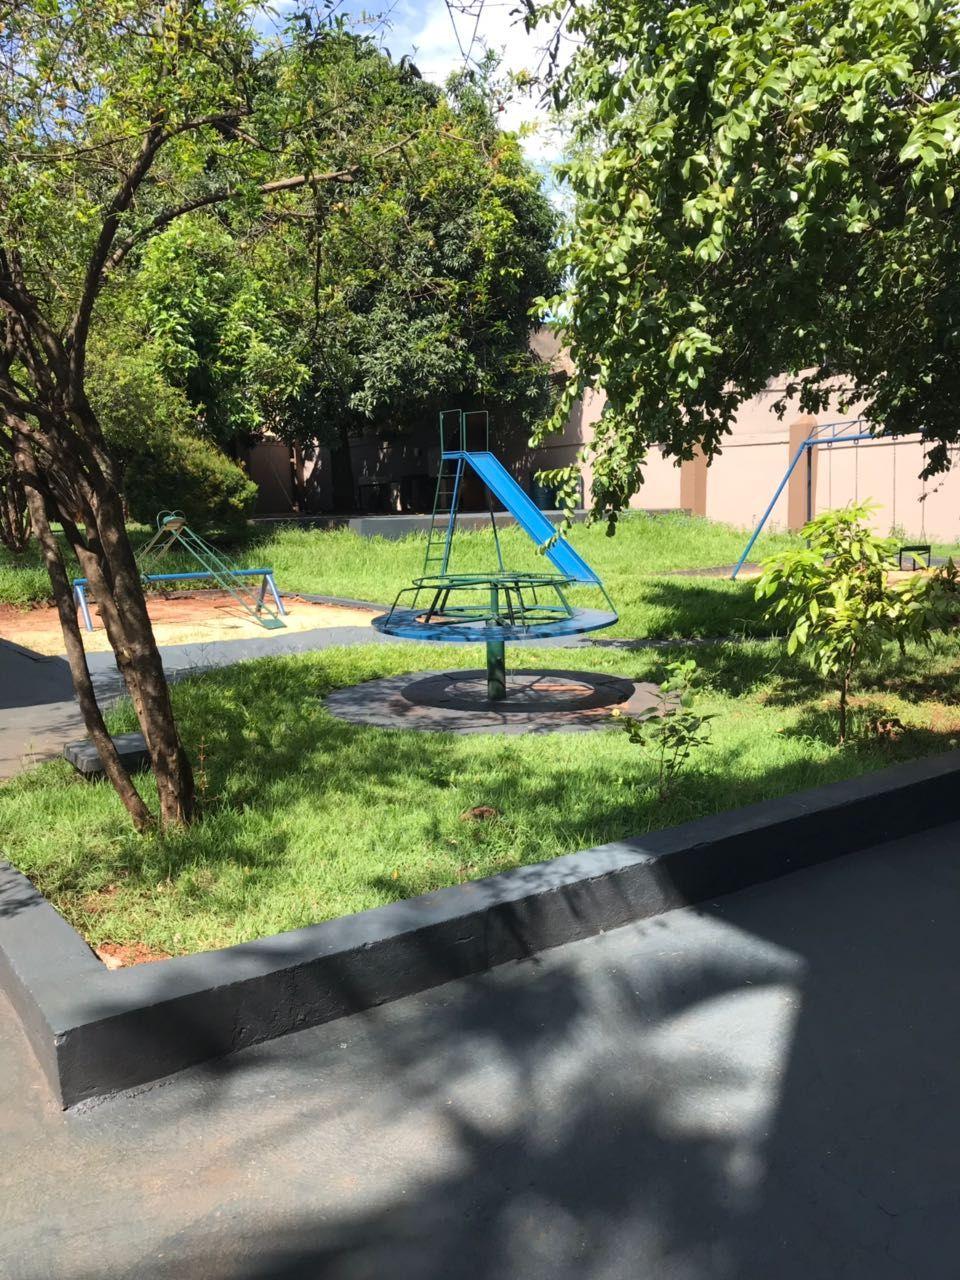 251 - Apto Cond. Jardim Paulista VENDIDO